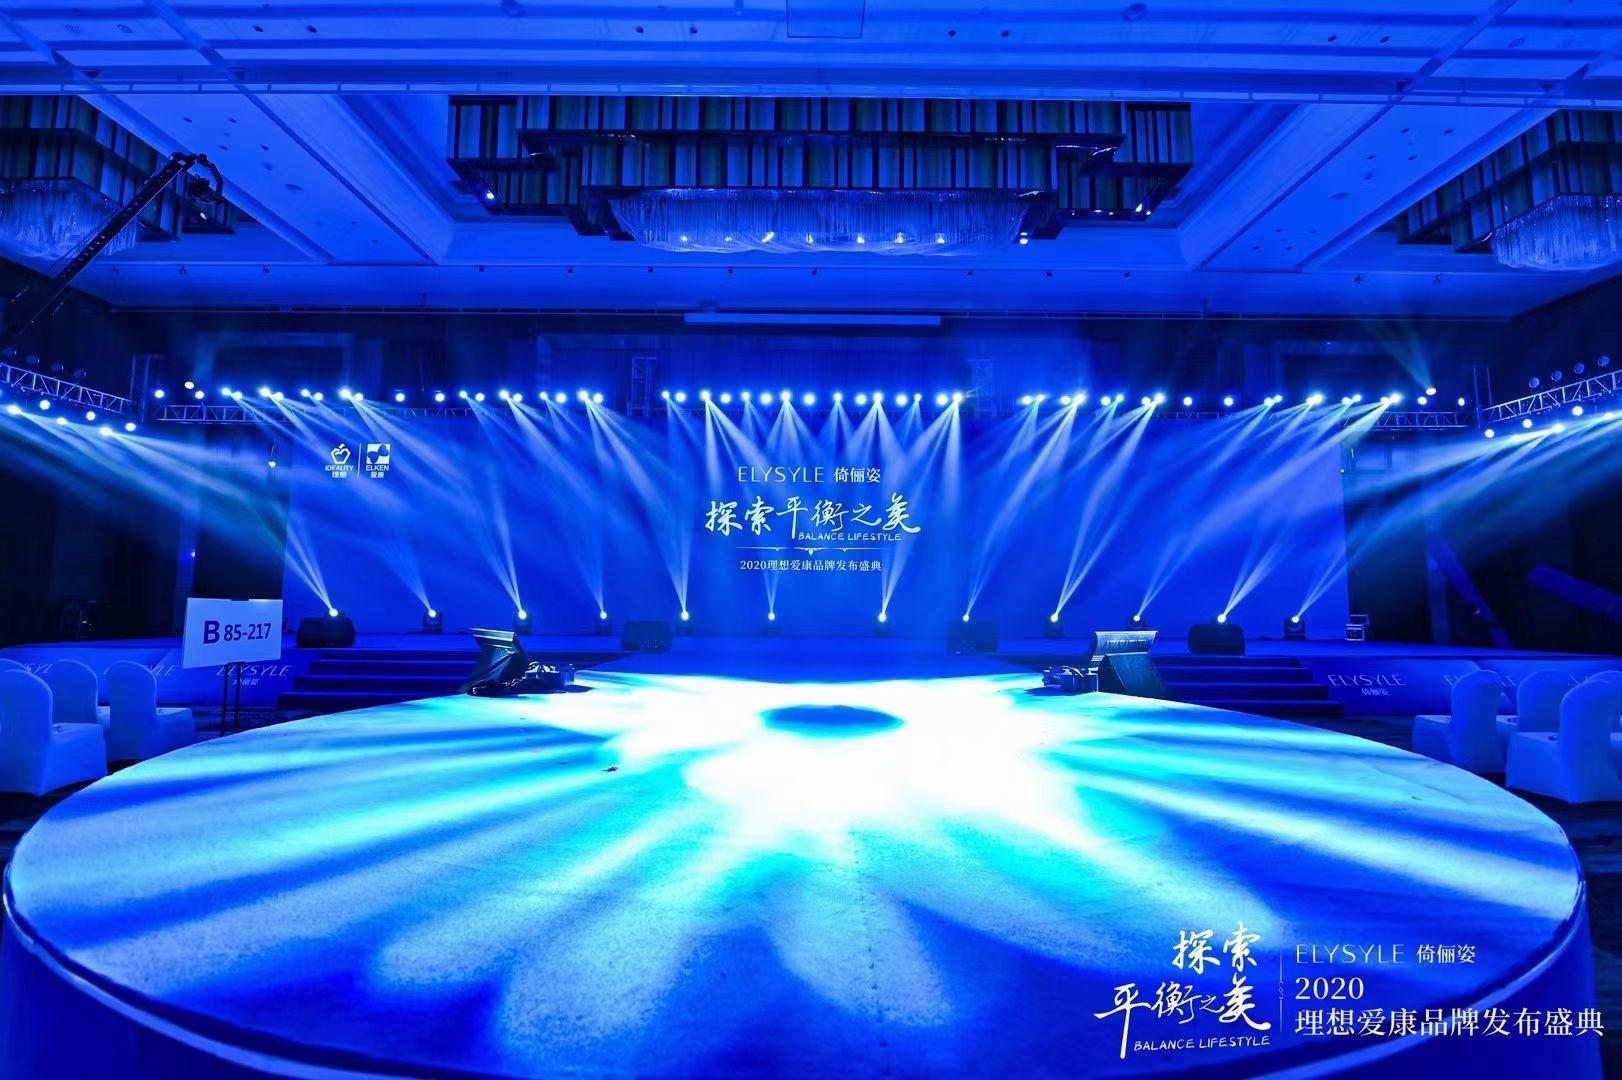 188bet官网手机版下载洲际酒店会议